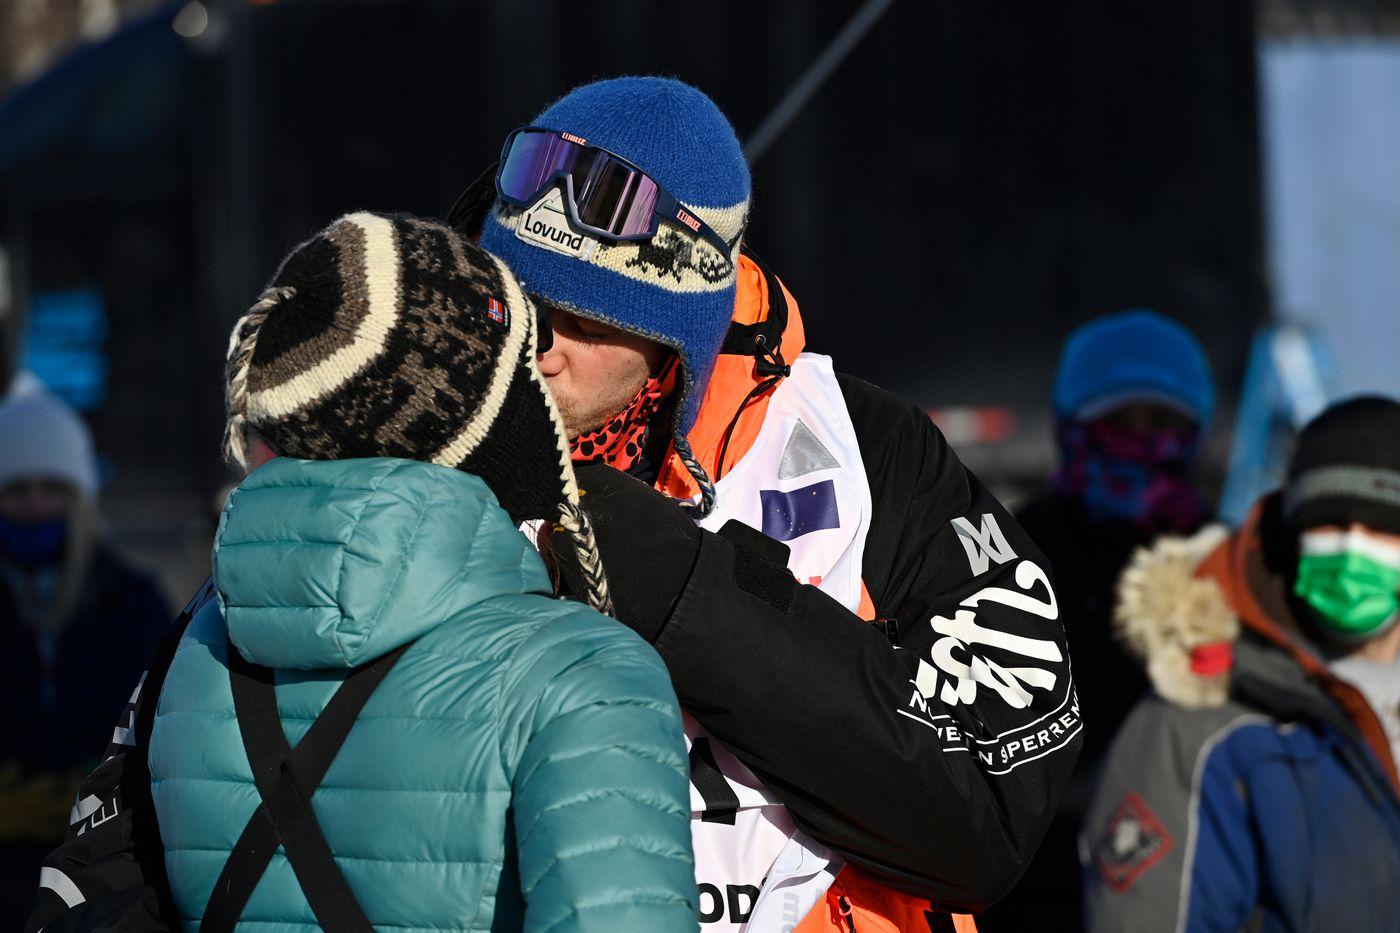 Joar Leifseth Ulsom gives a kiss before he begins his run. (Marc Lester / ADN)